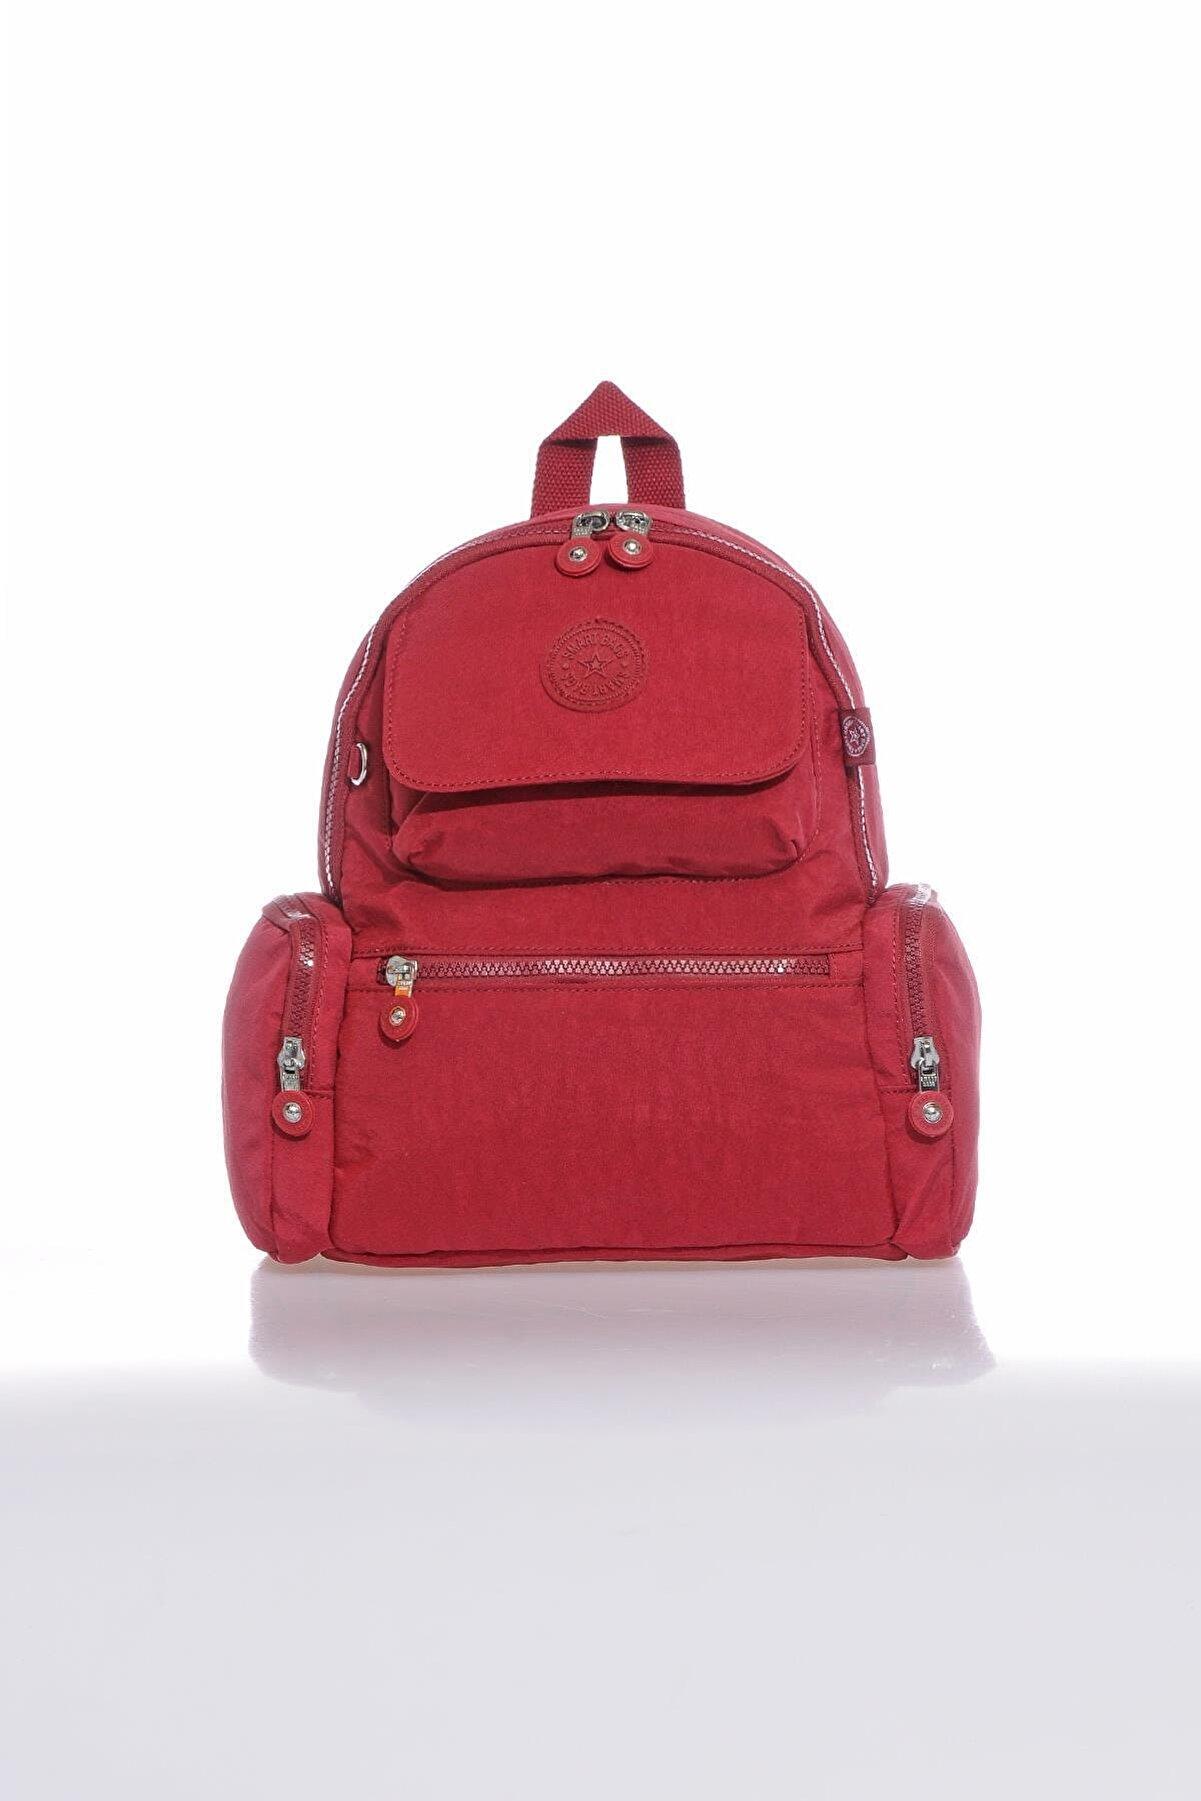 Smart Bags Smb3077-0021 Bordo Kadın Sırt Çantası